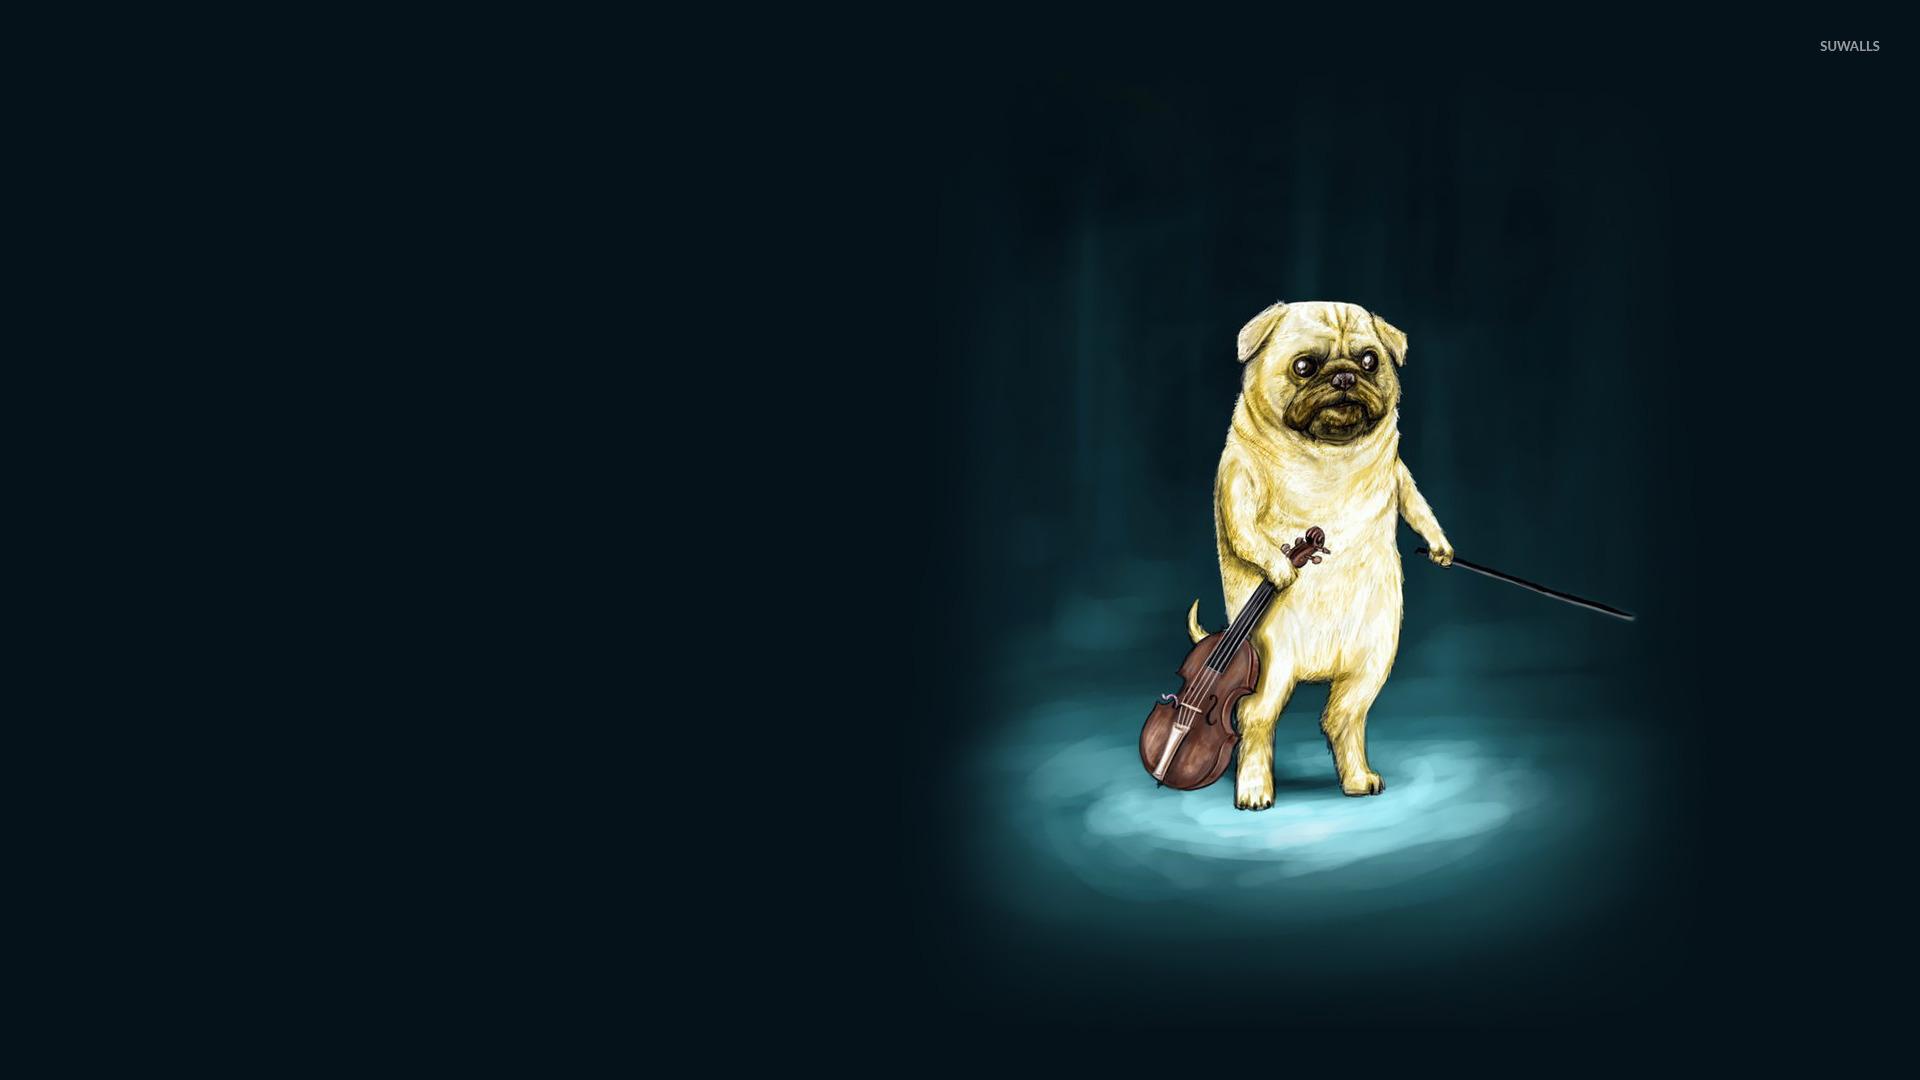 Download Pug Dog Hd Wallpaper Gallery: Violino Wallpaper HD